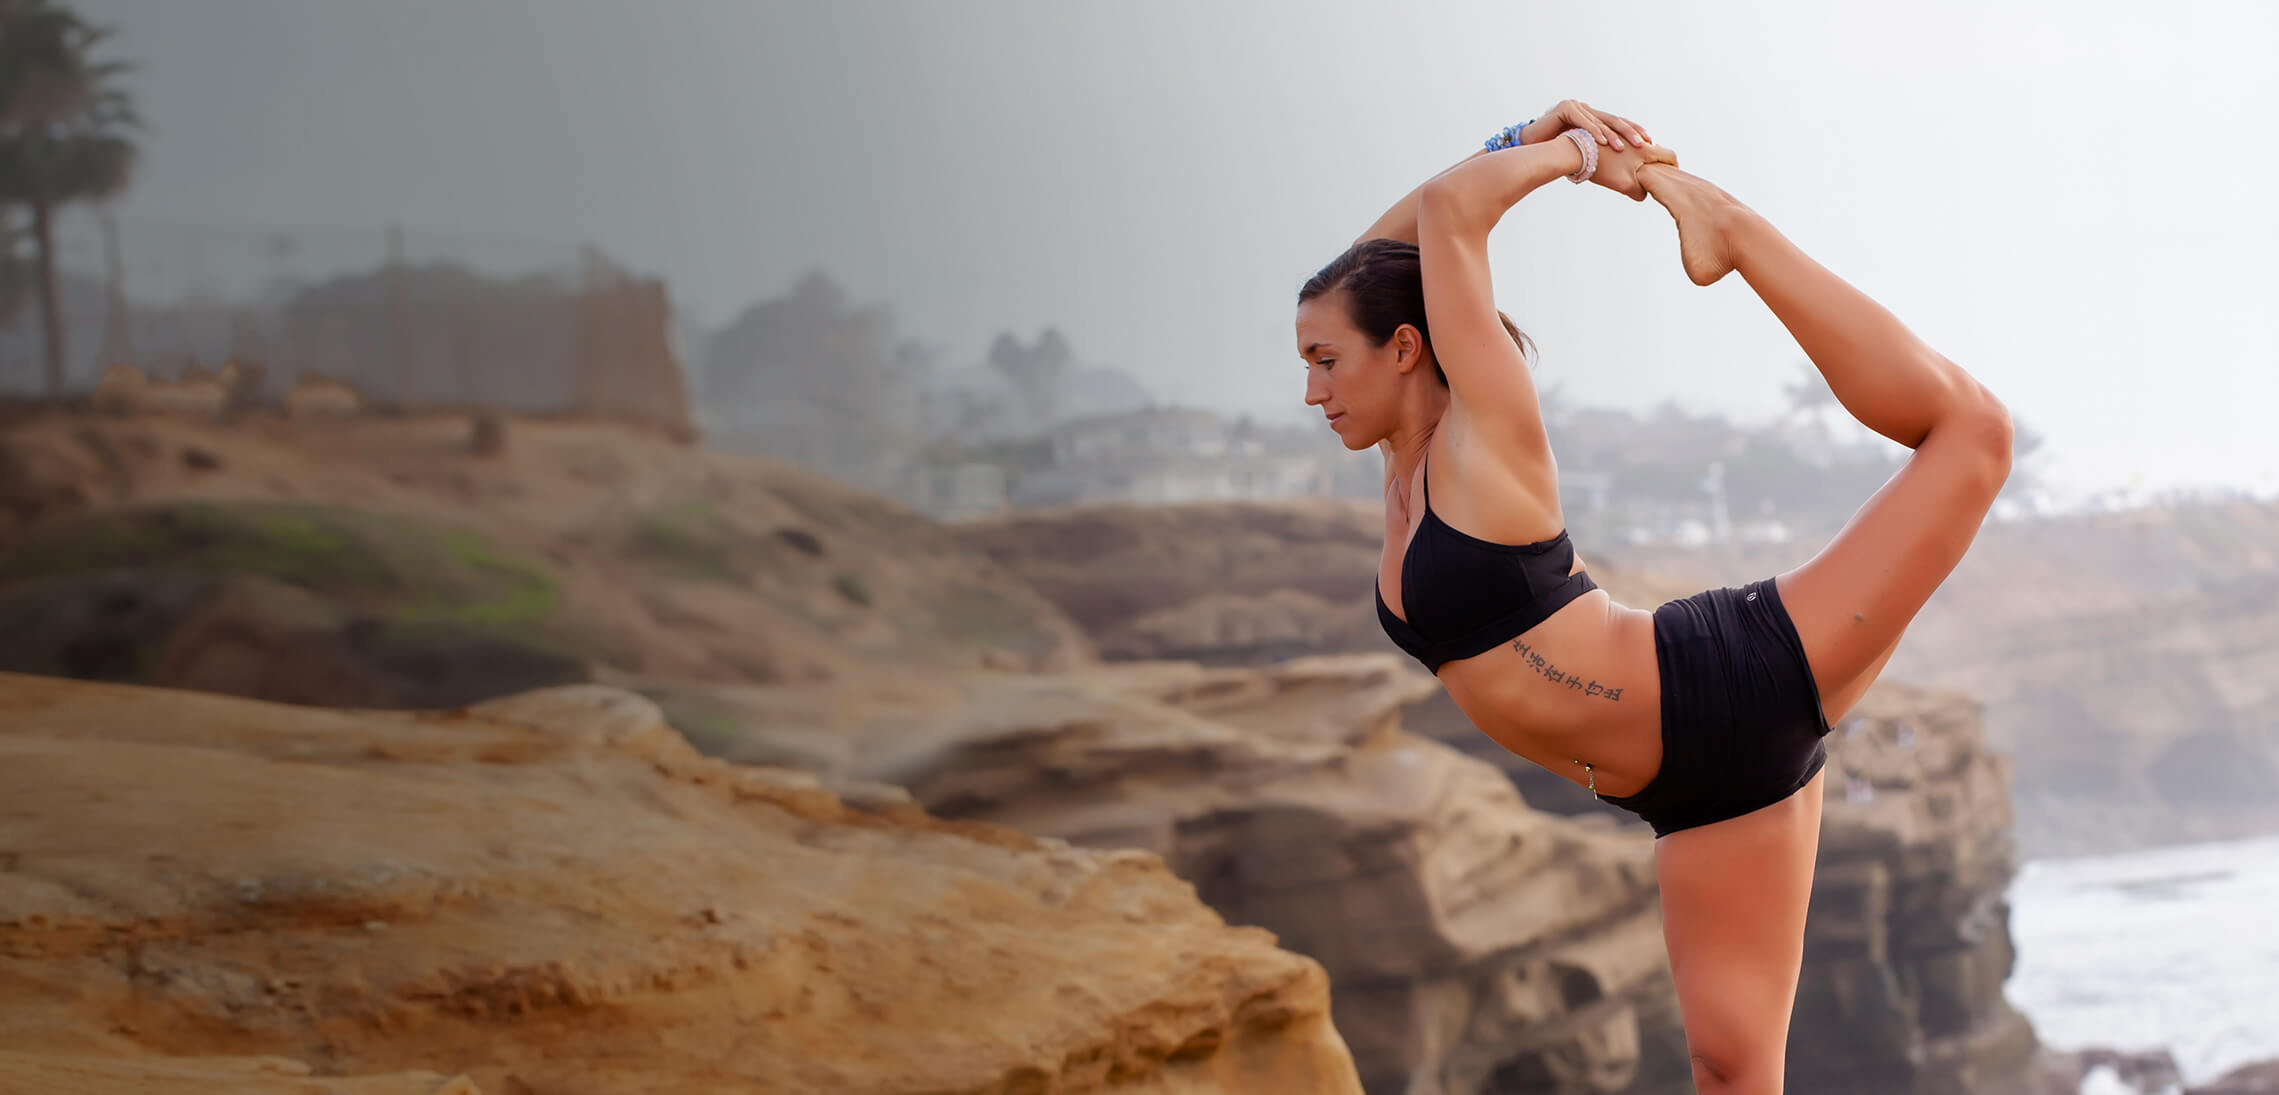 Mindful Yoga & Meditation <br>with Katie B. Happyy